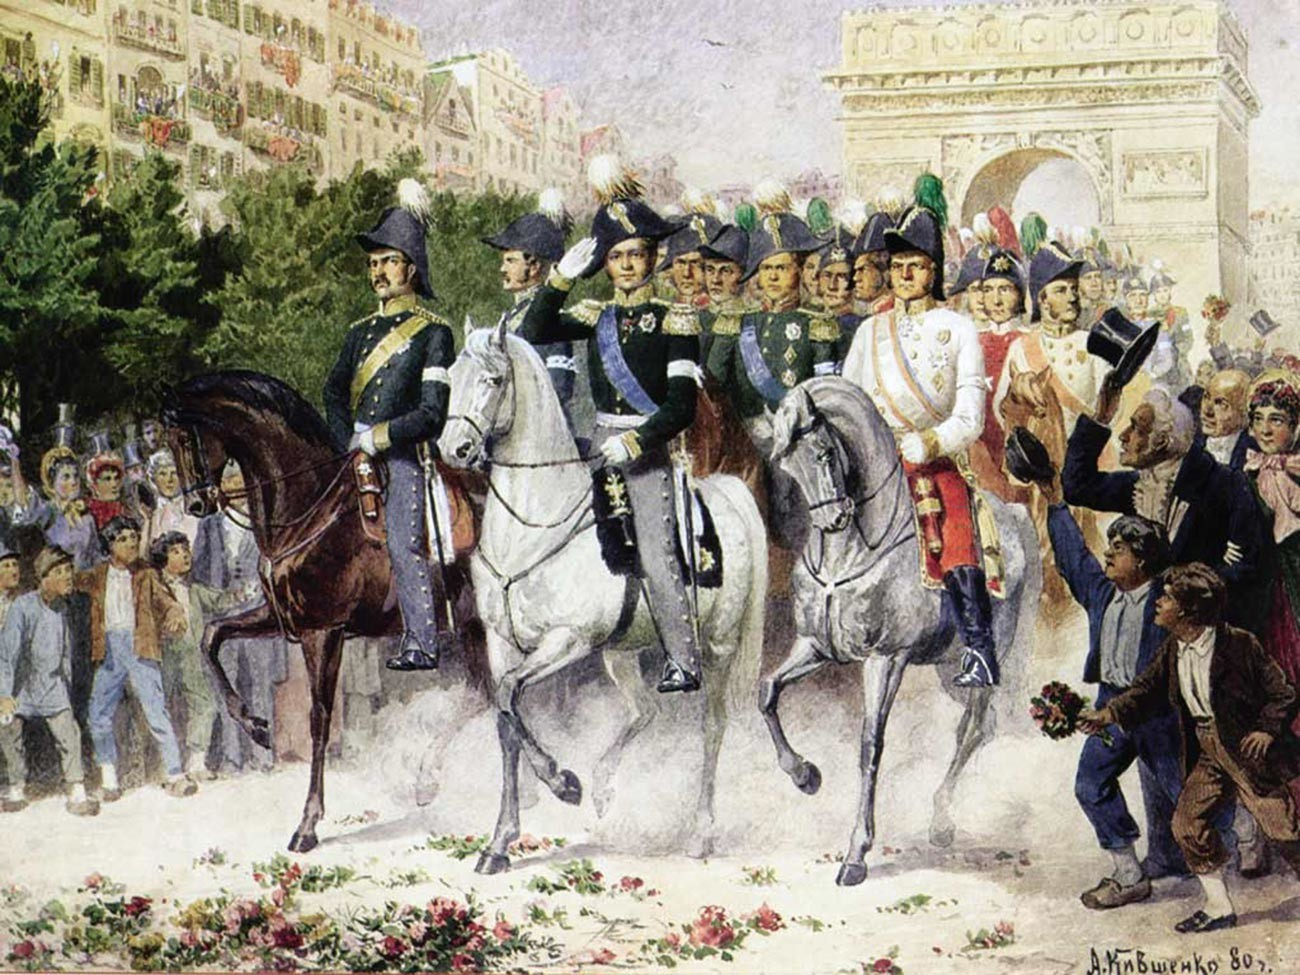 Russian army entering Paris in 1814